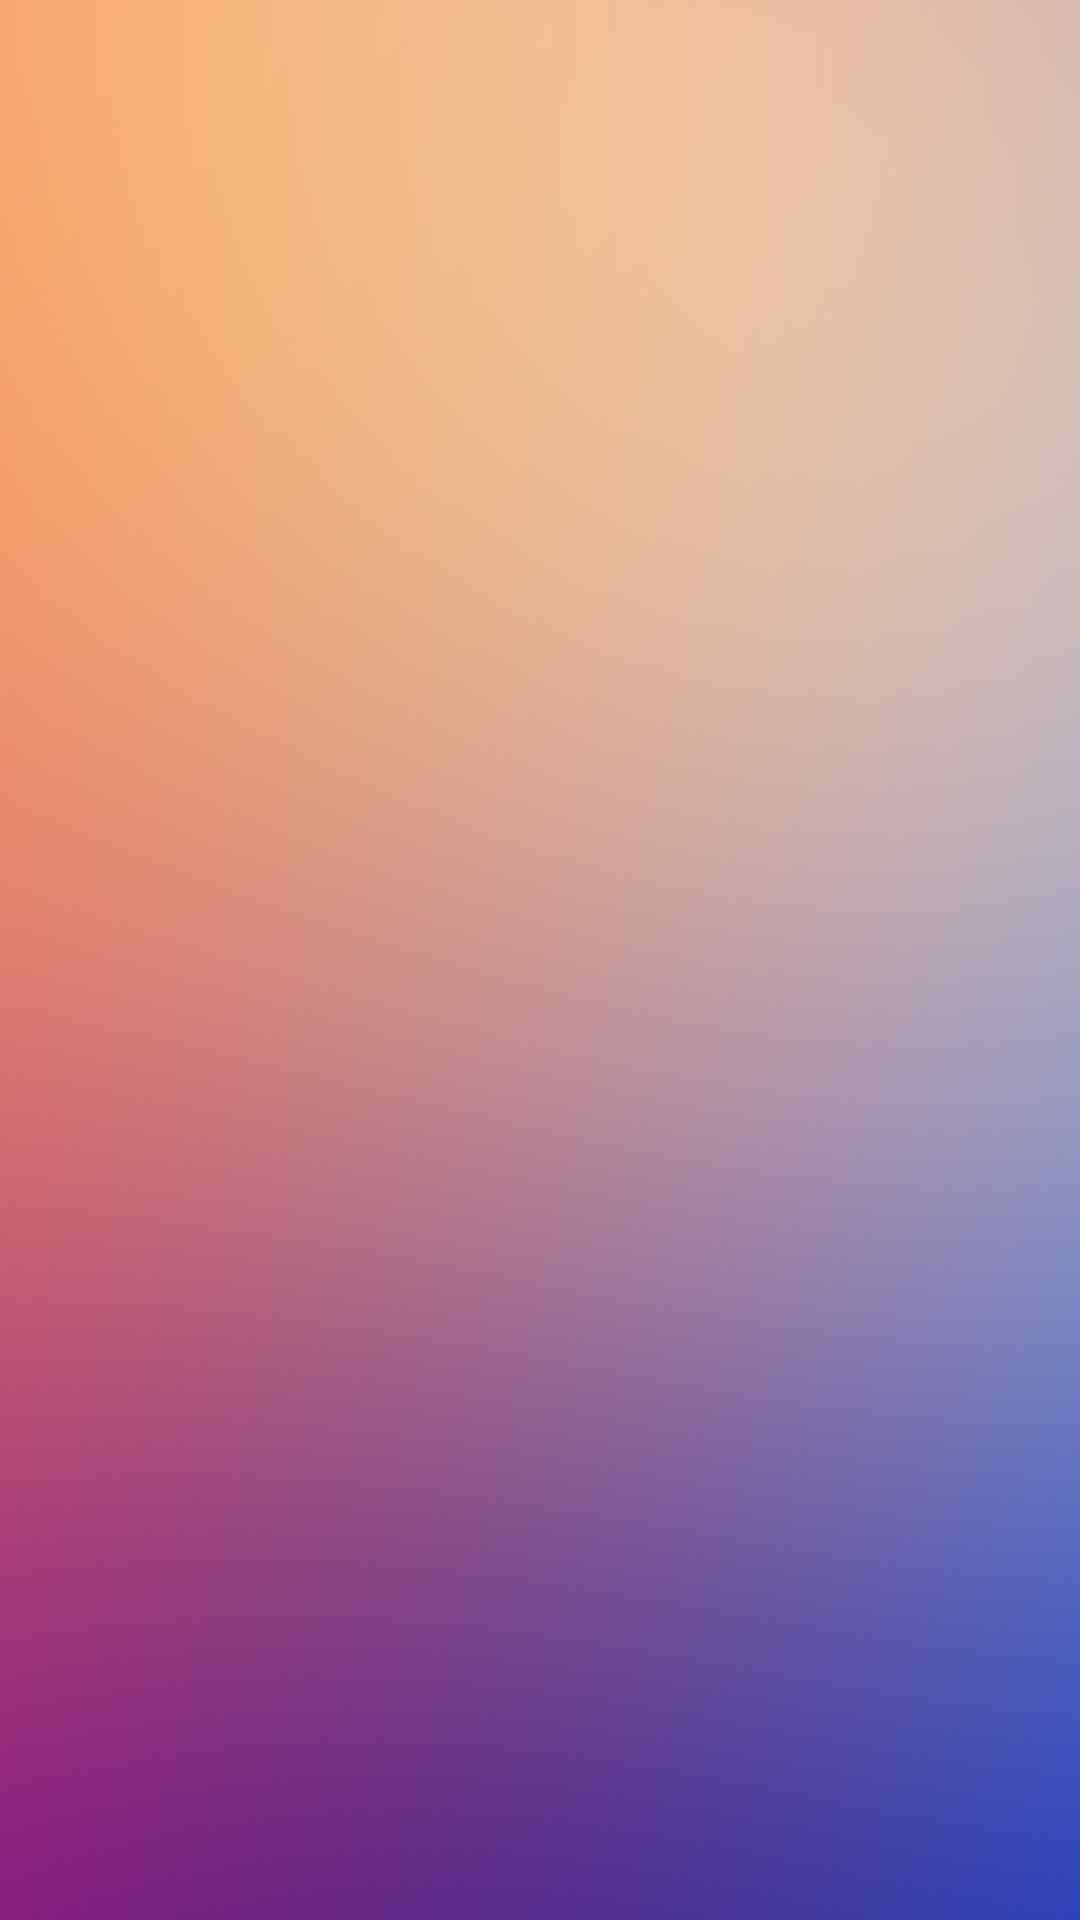 Pattern orange purple blue Android SmartPhone Wallpaper